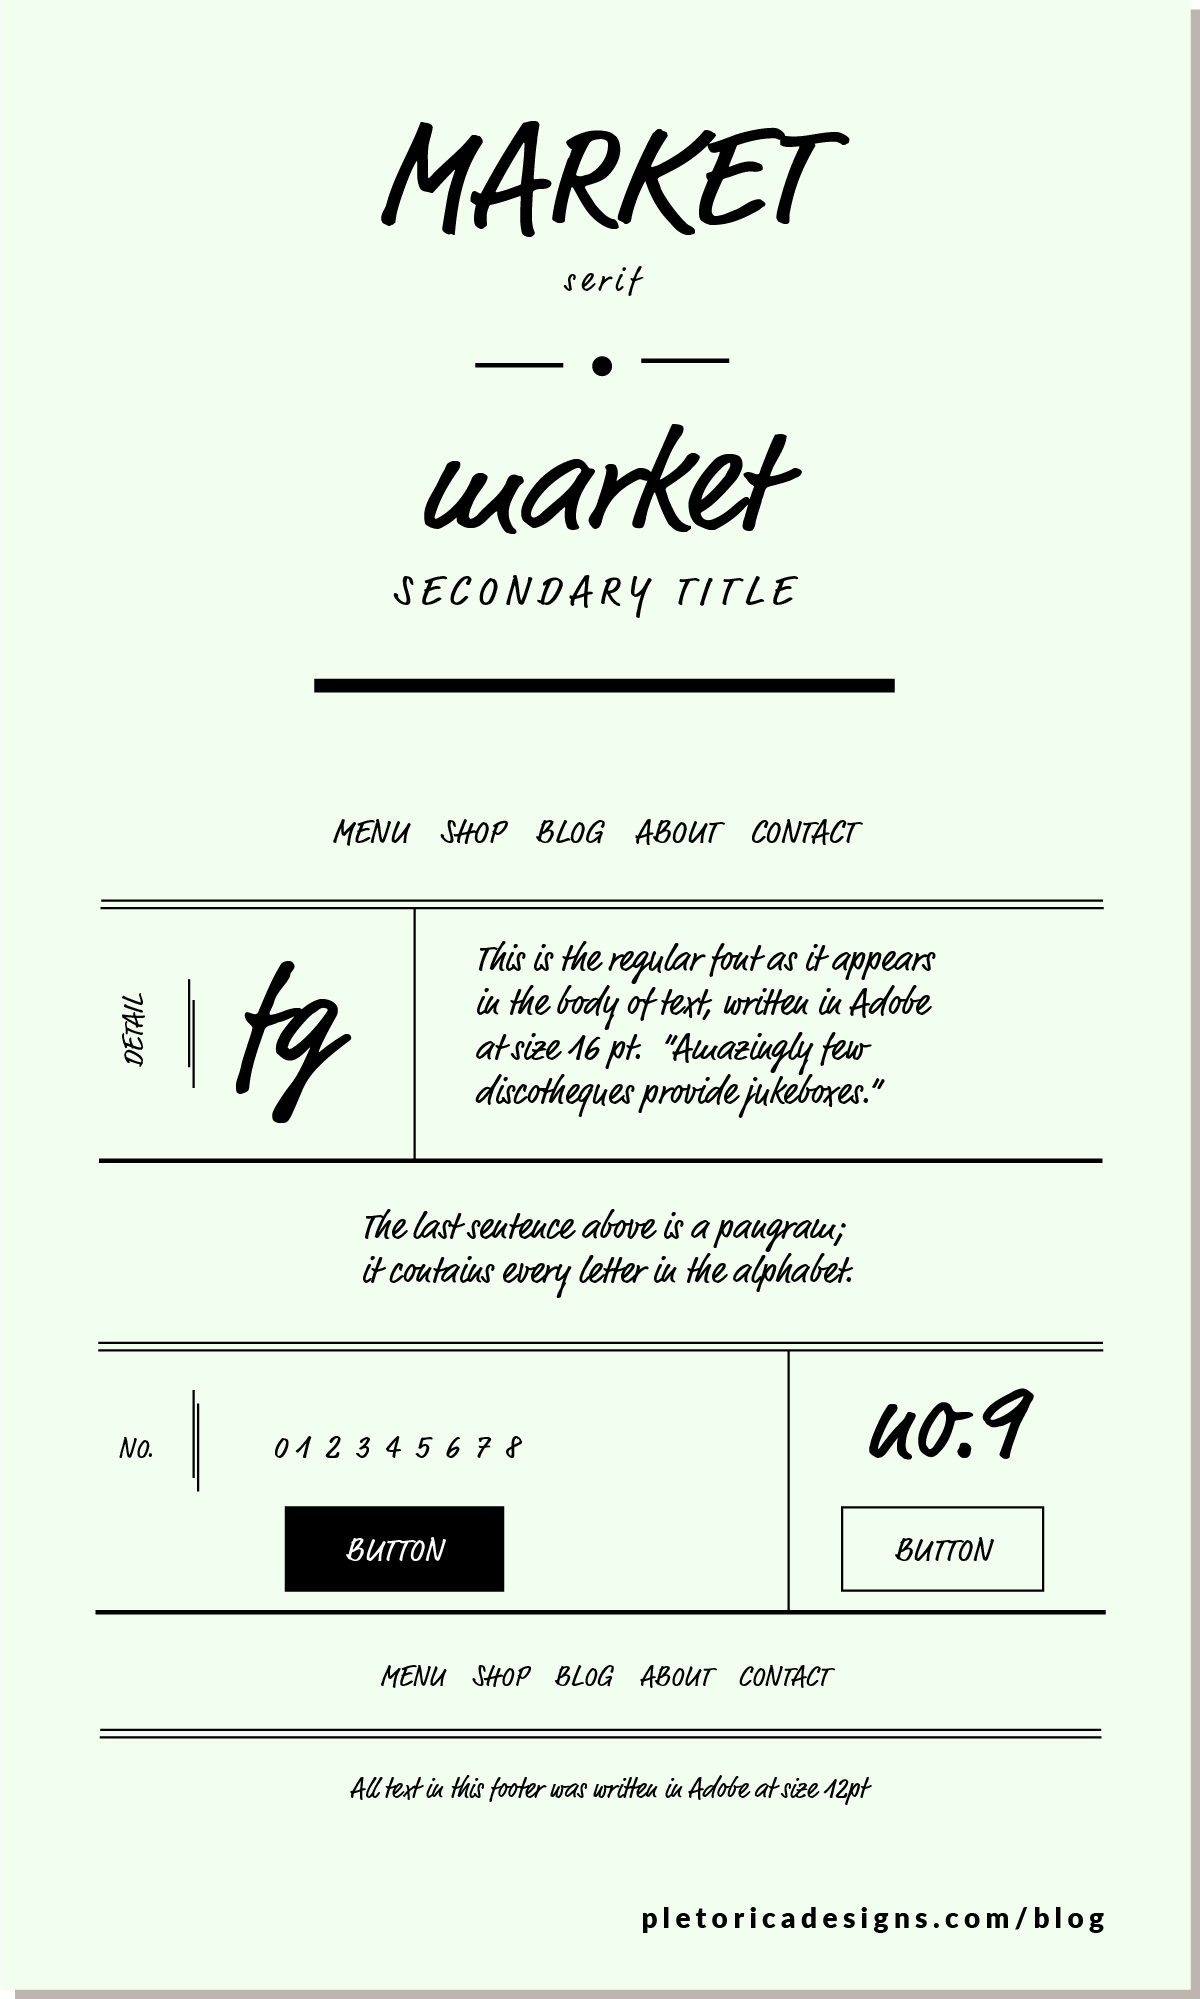 LET'S TYPE: Market — PLETÓRICA DESIGNS